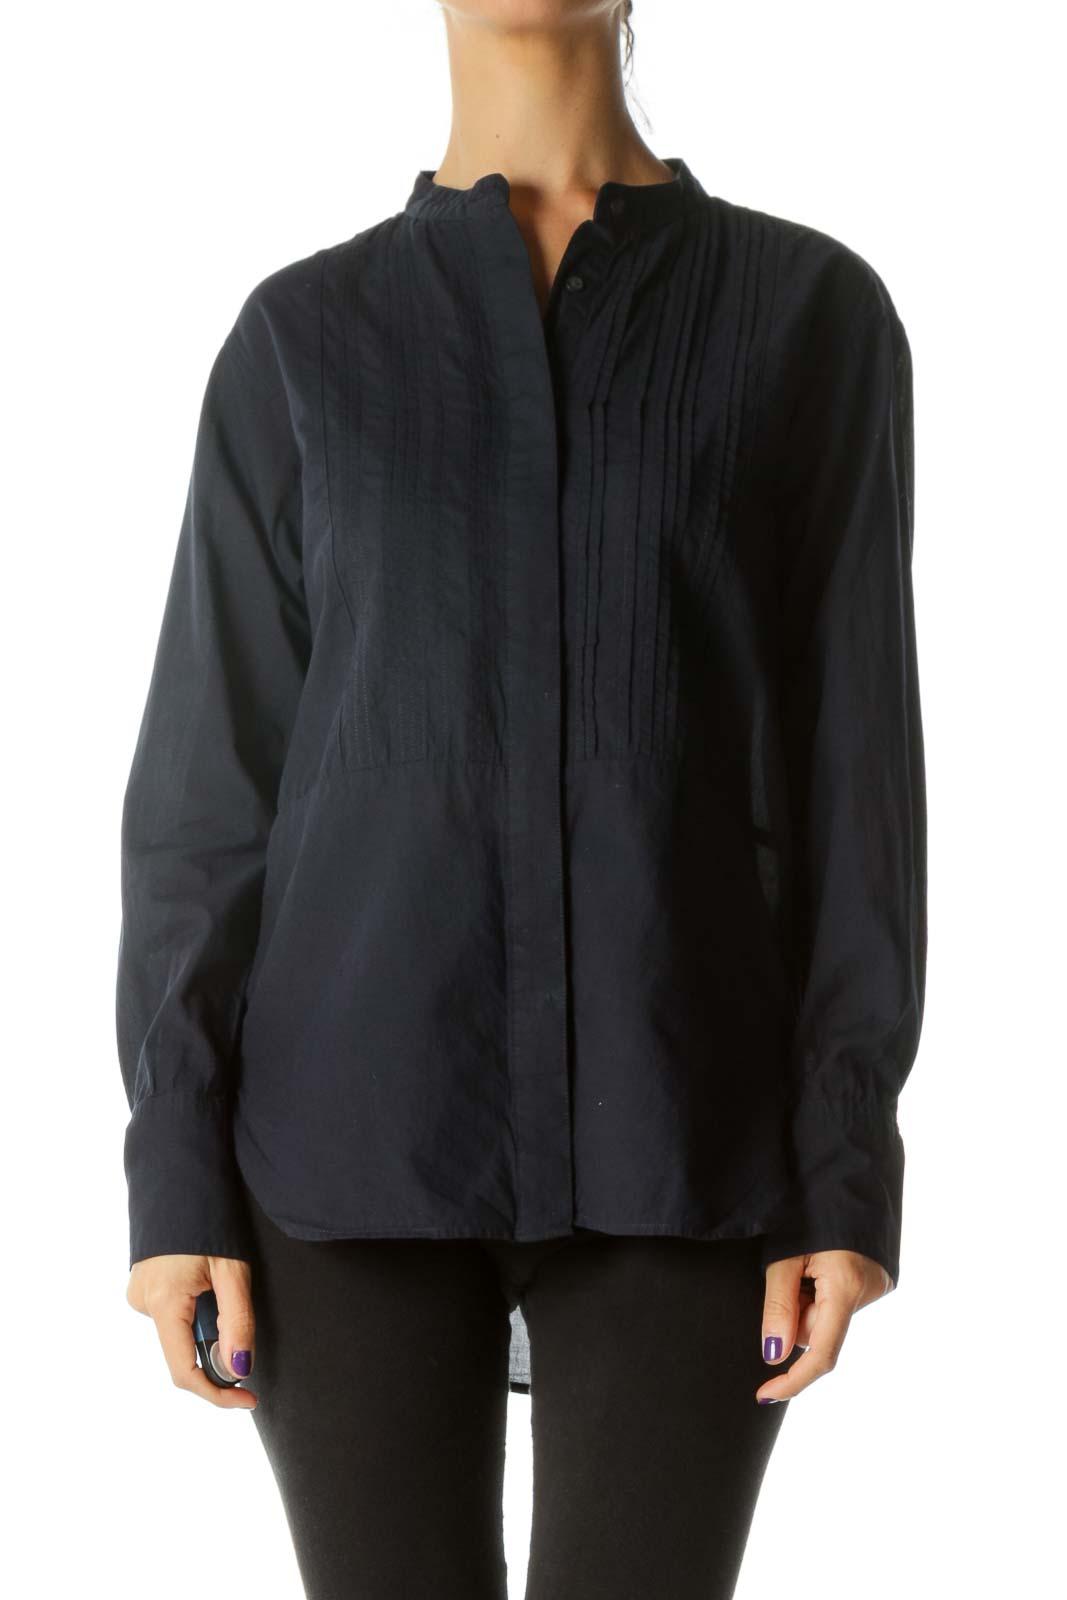 Navy Blue 100% Cotton Pleated Round Neck Shirt